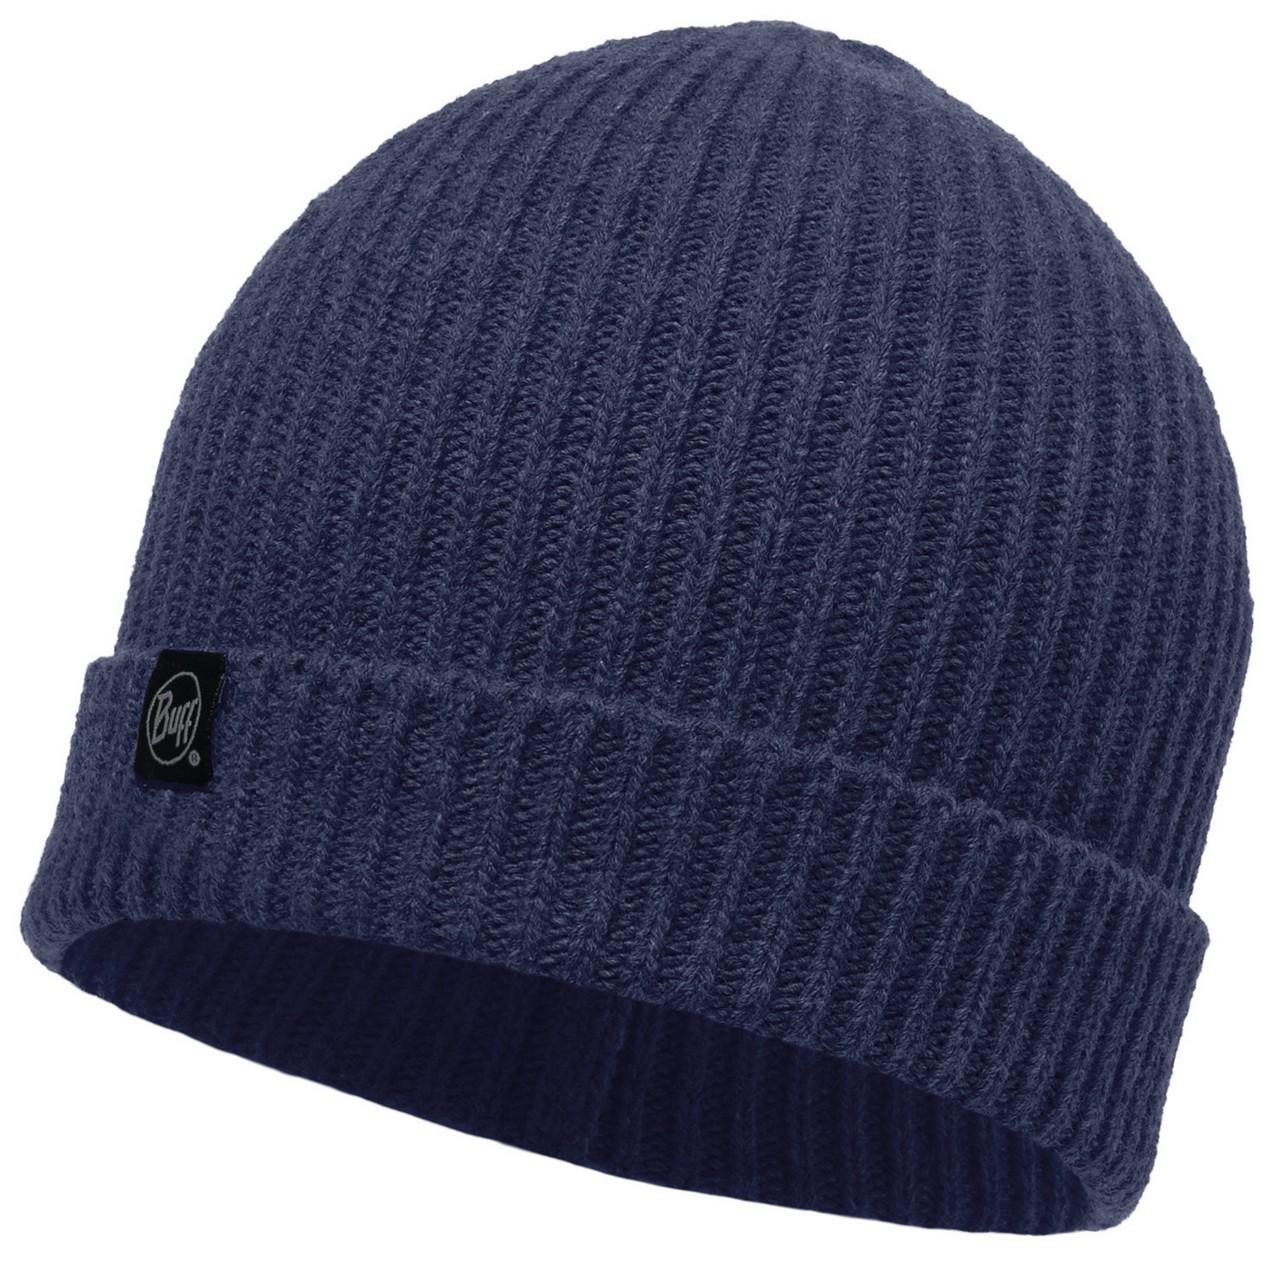 Вязаная шапка Buff Basic Dark Navy